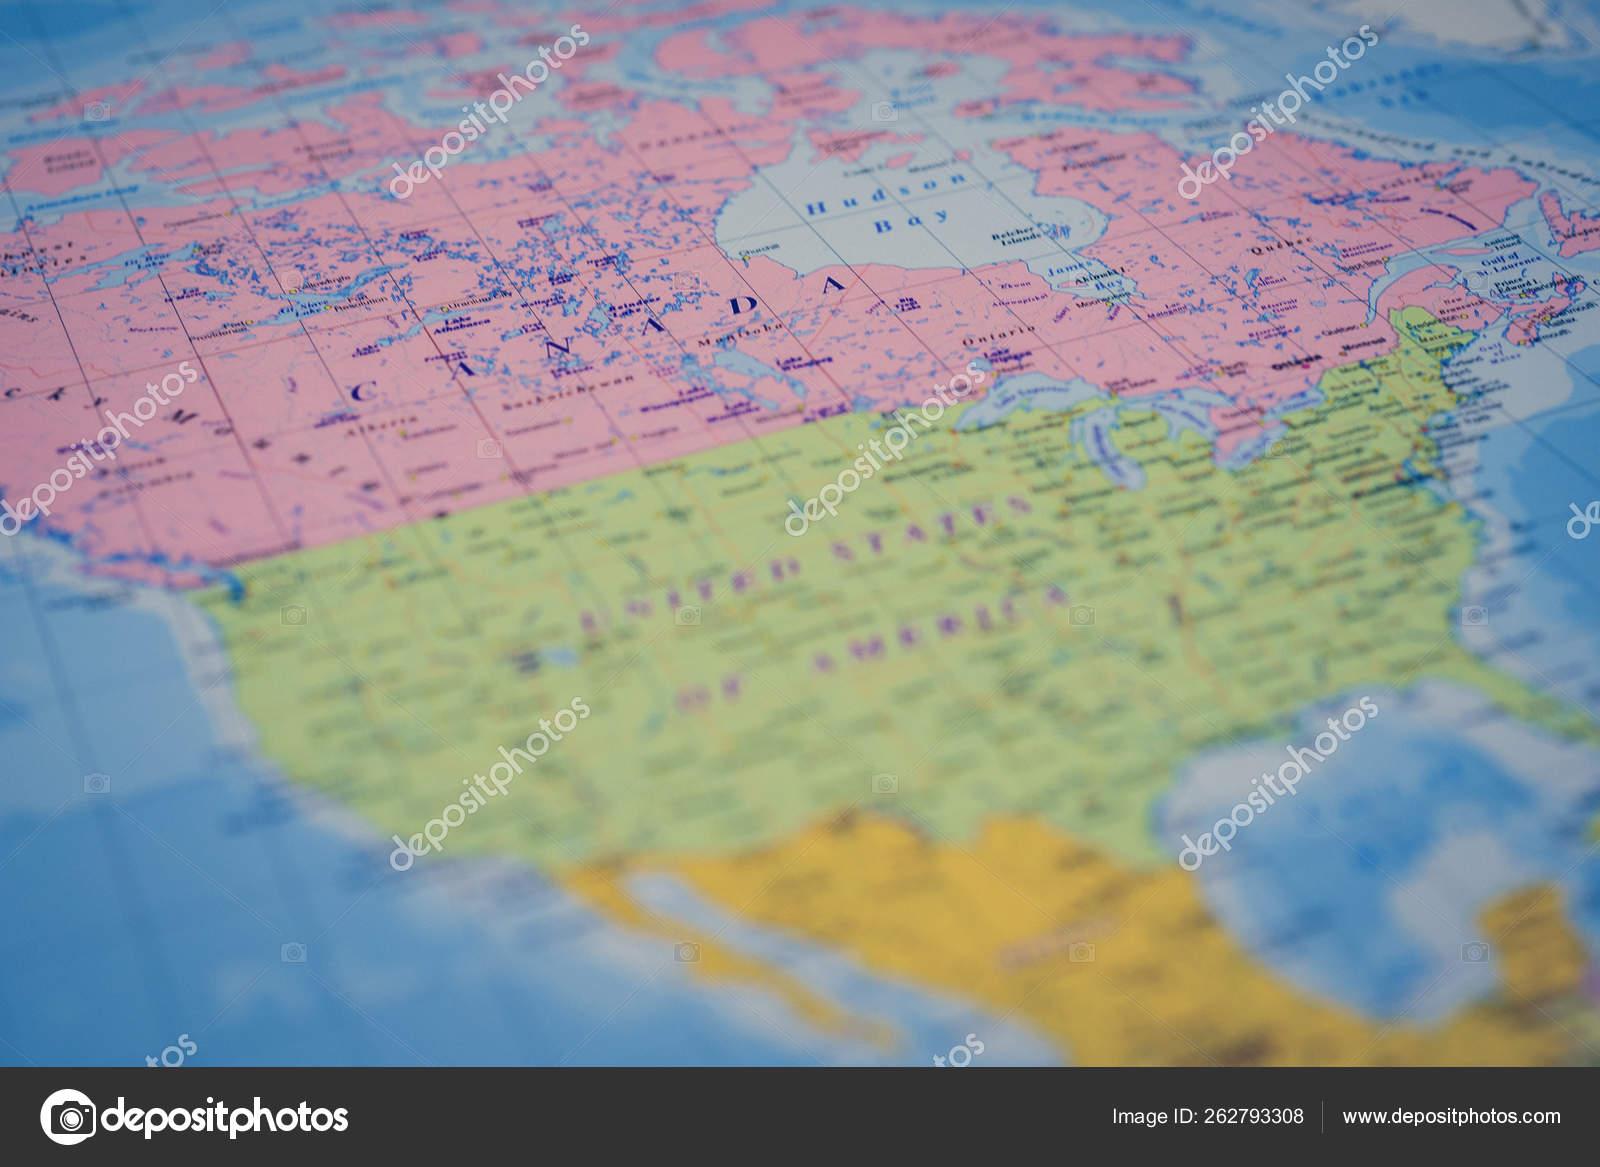 North America on the world map — Stockfoto © aallm #262793308